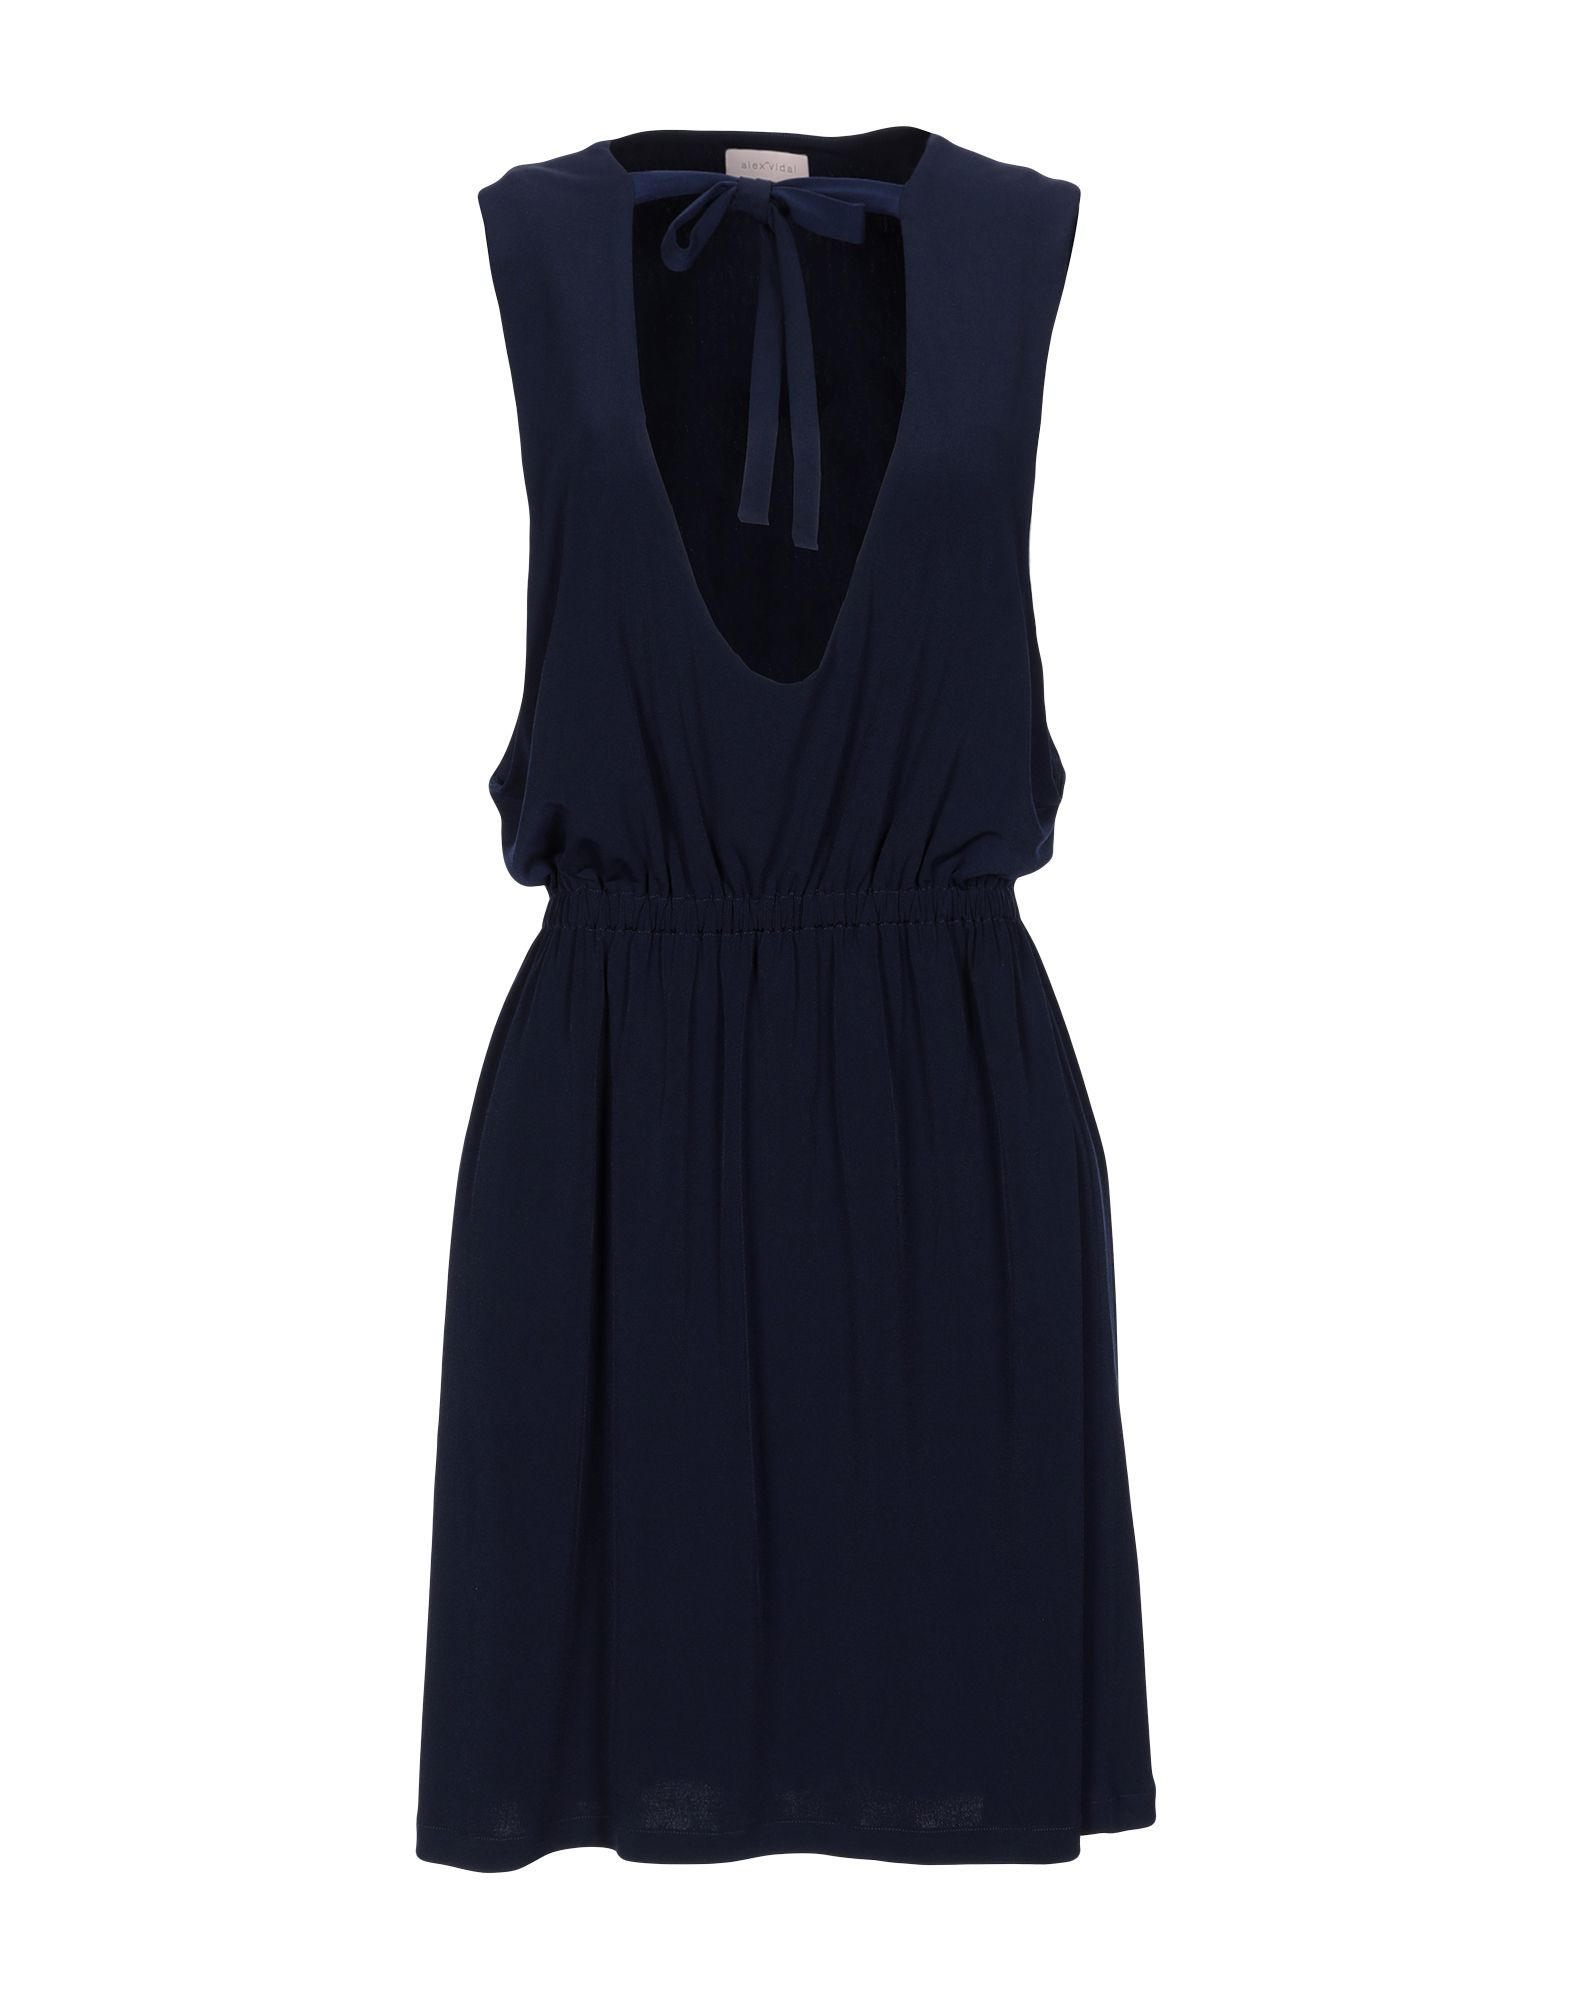 ALEX VIDAL Короткое платье платье alex lu alex lu mp002xw0jbke